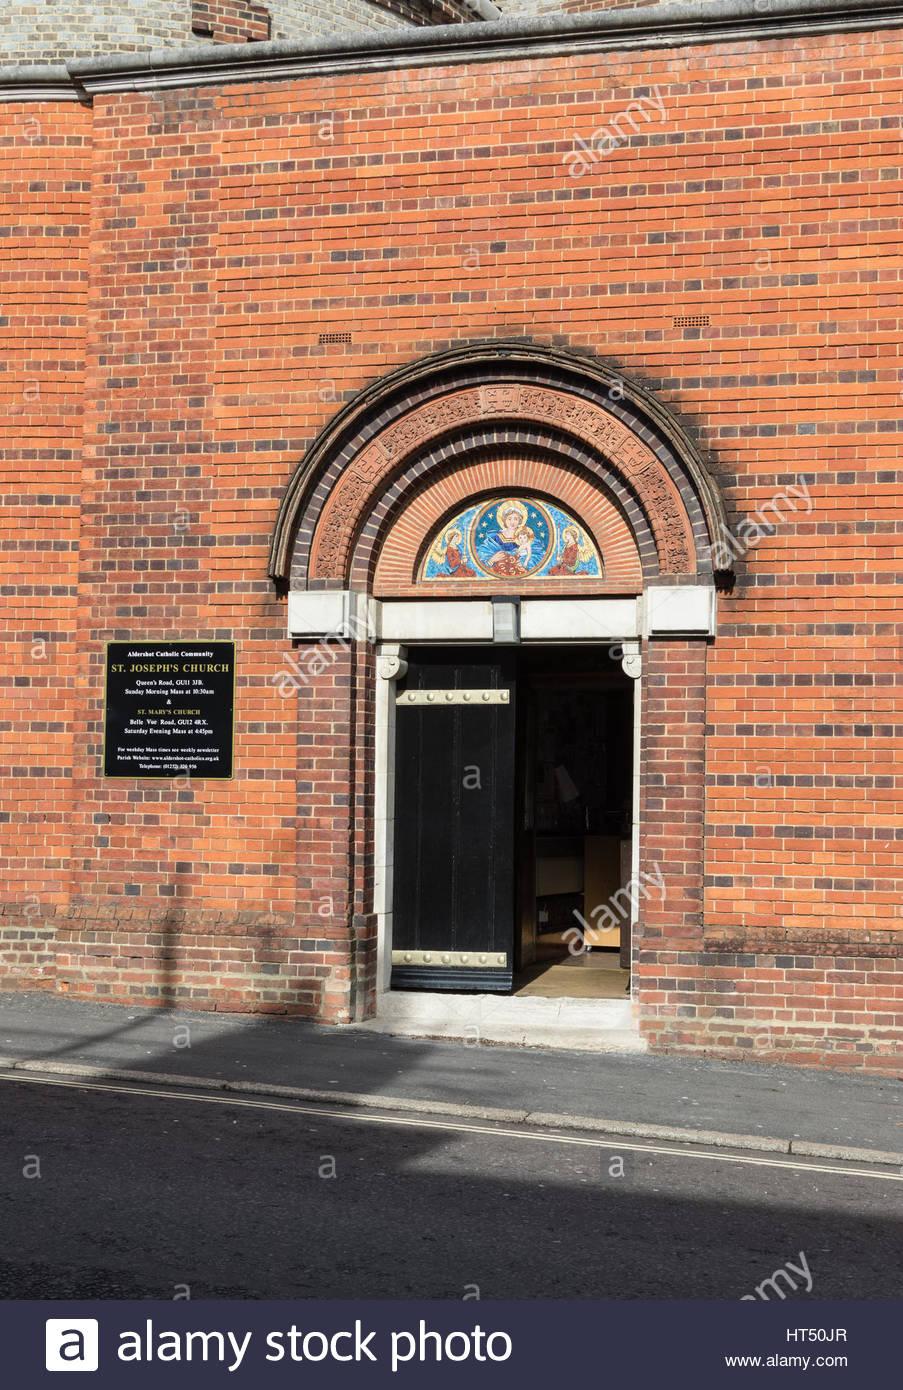 Exterior of St Joseph's Church, a Roman Catholic Parish church in Aldershot, Hampshire - Stock Image